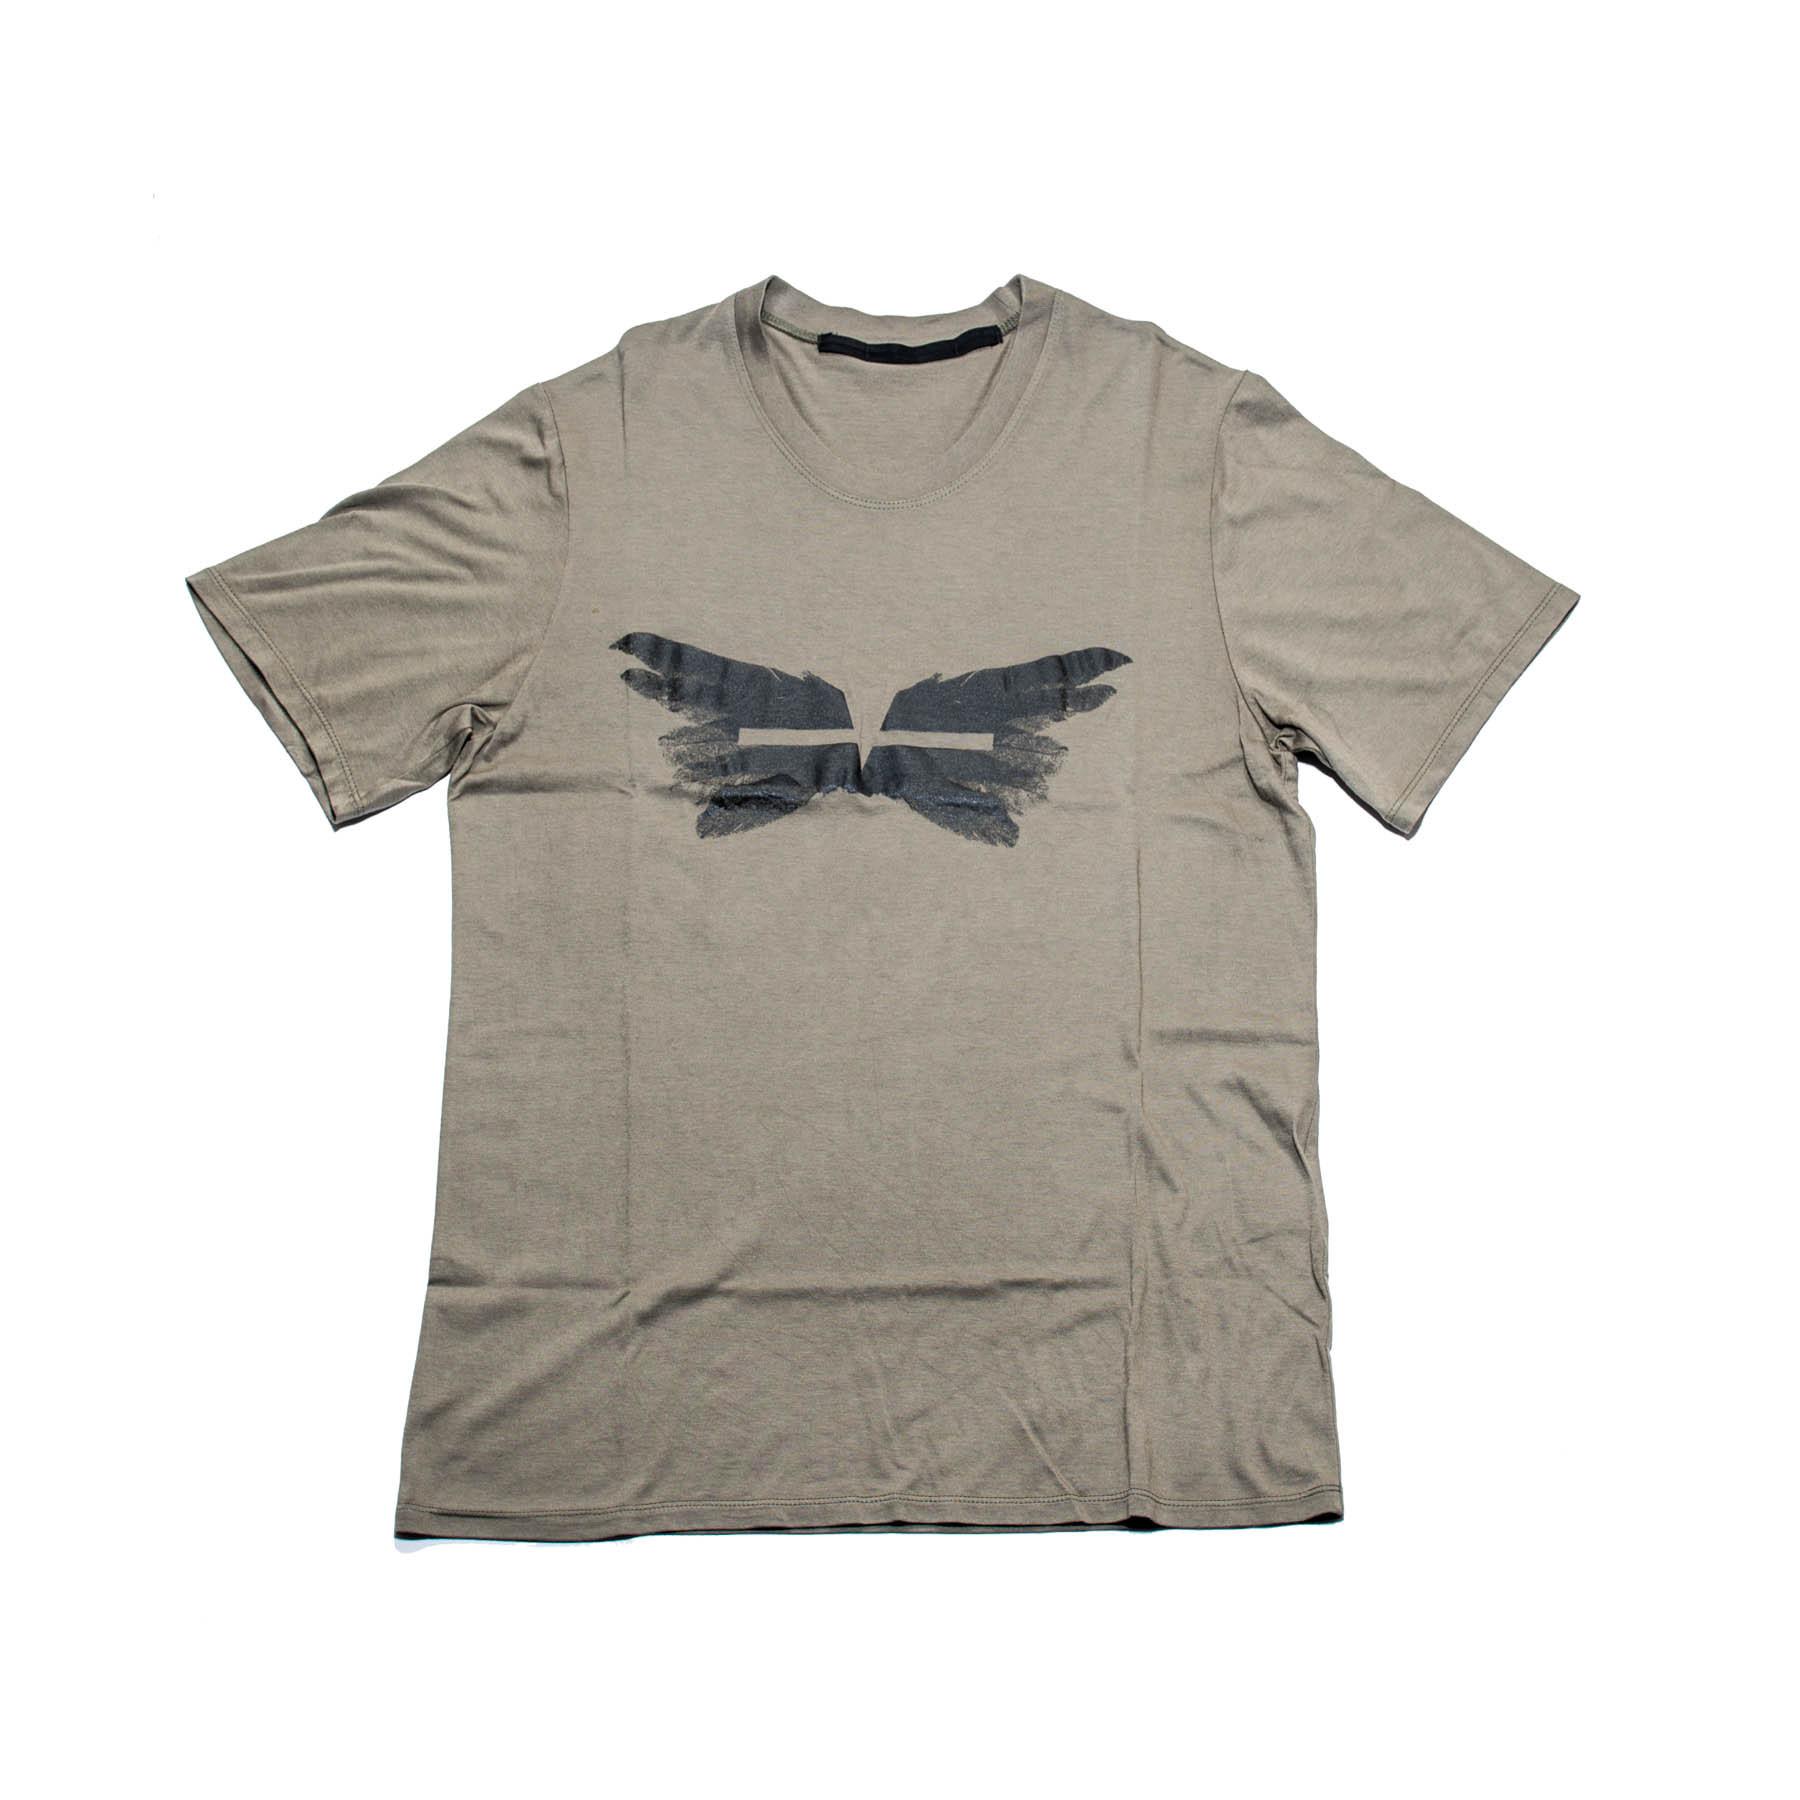 617CPM11-KHAKI / ウイングTシャツ